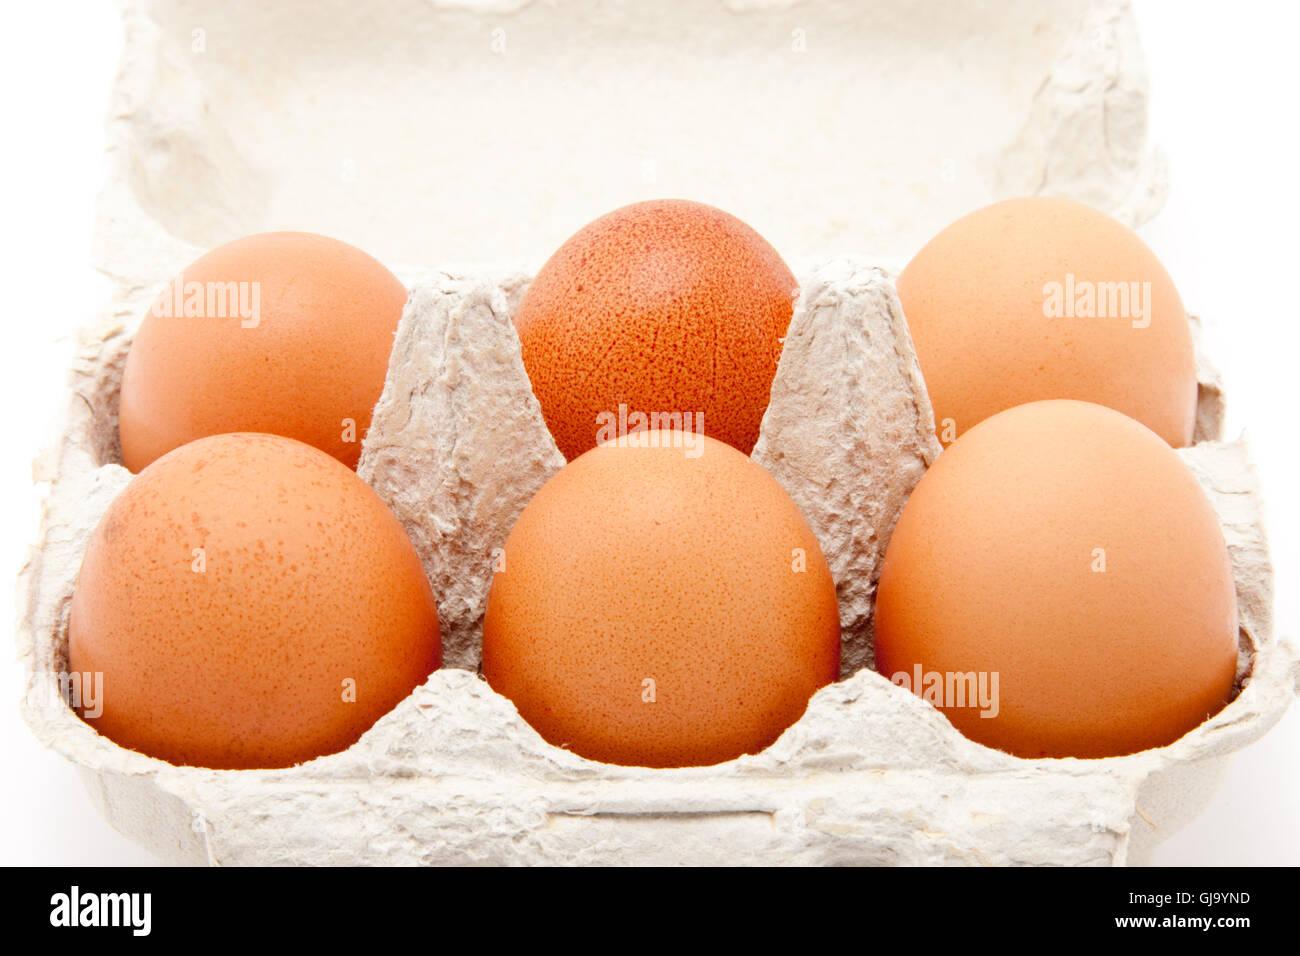 six brown organic eggs in a box - Stock Image